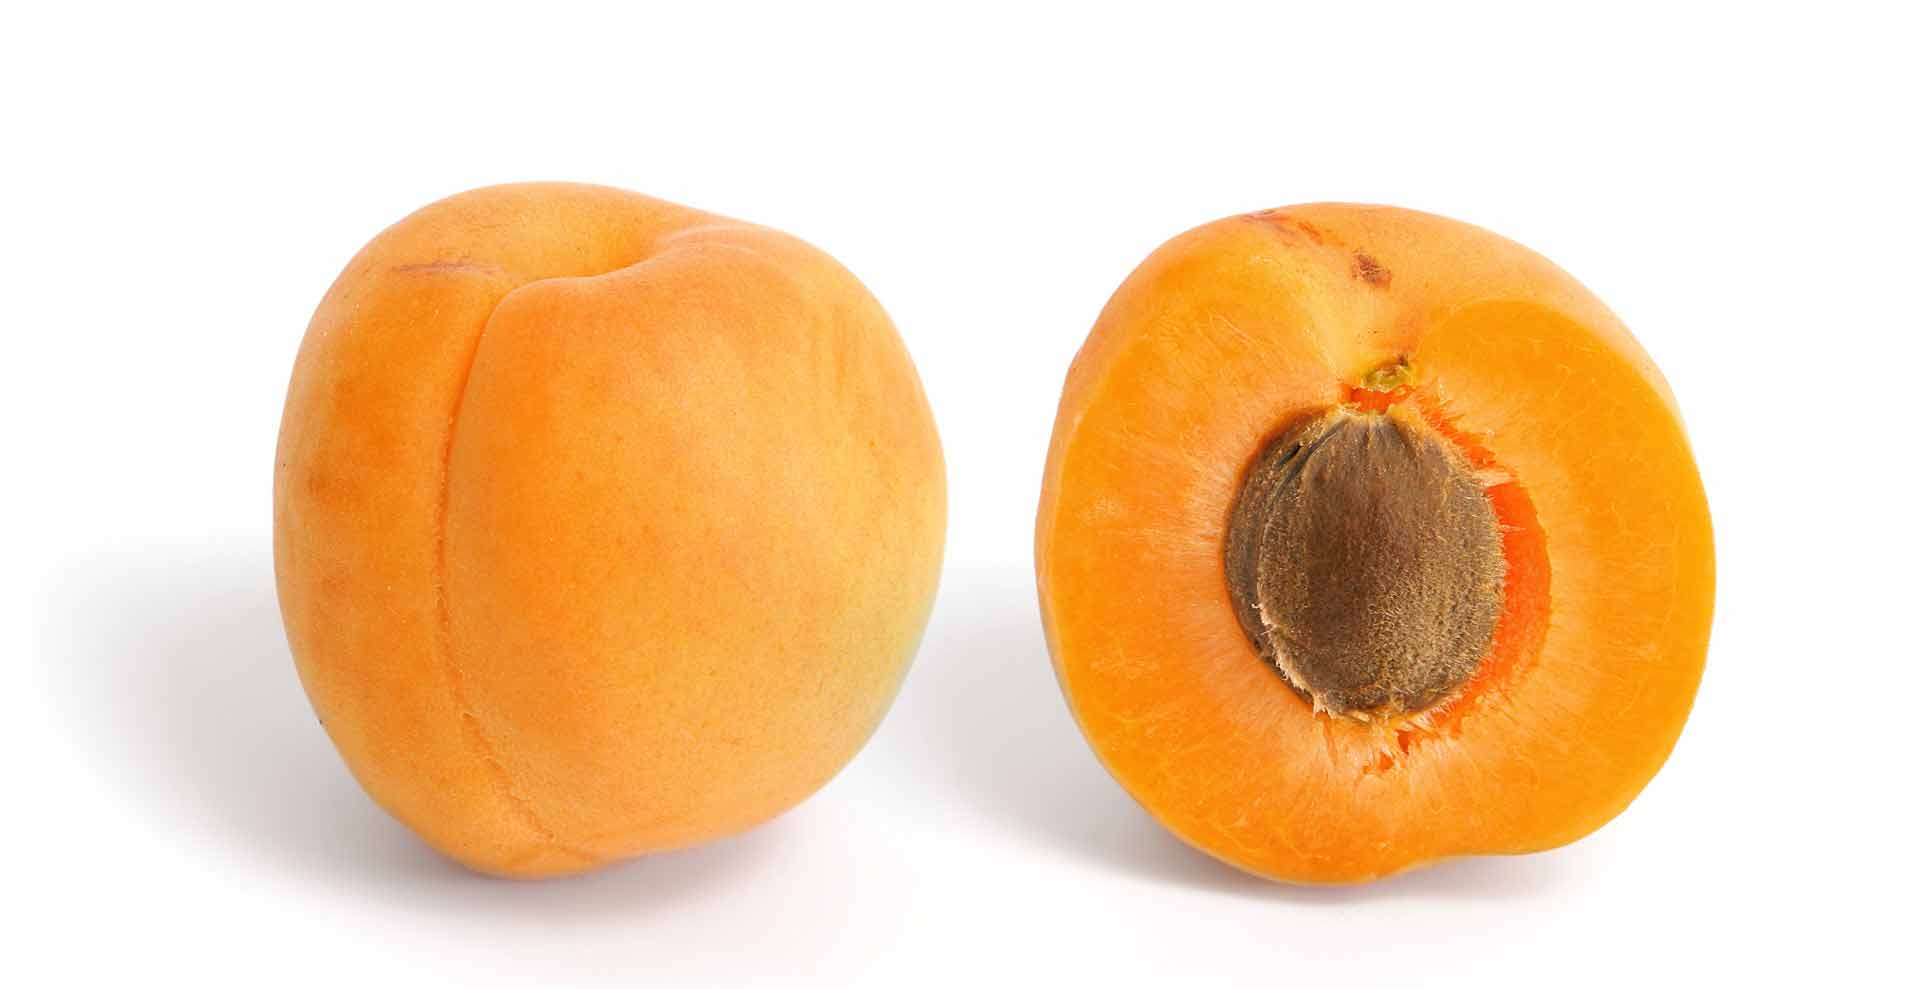 абрикос, застосування абрикоса, властивості абрикоса, лечение абрикосам,